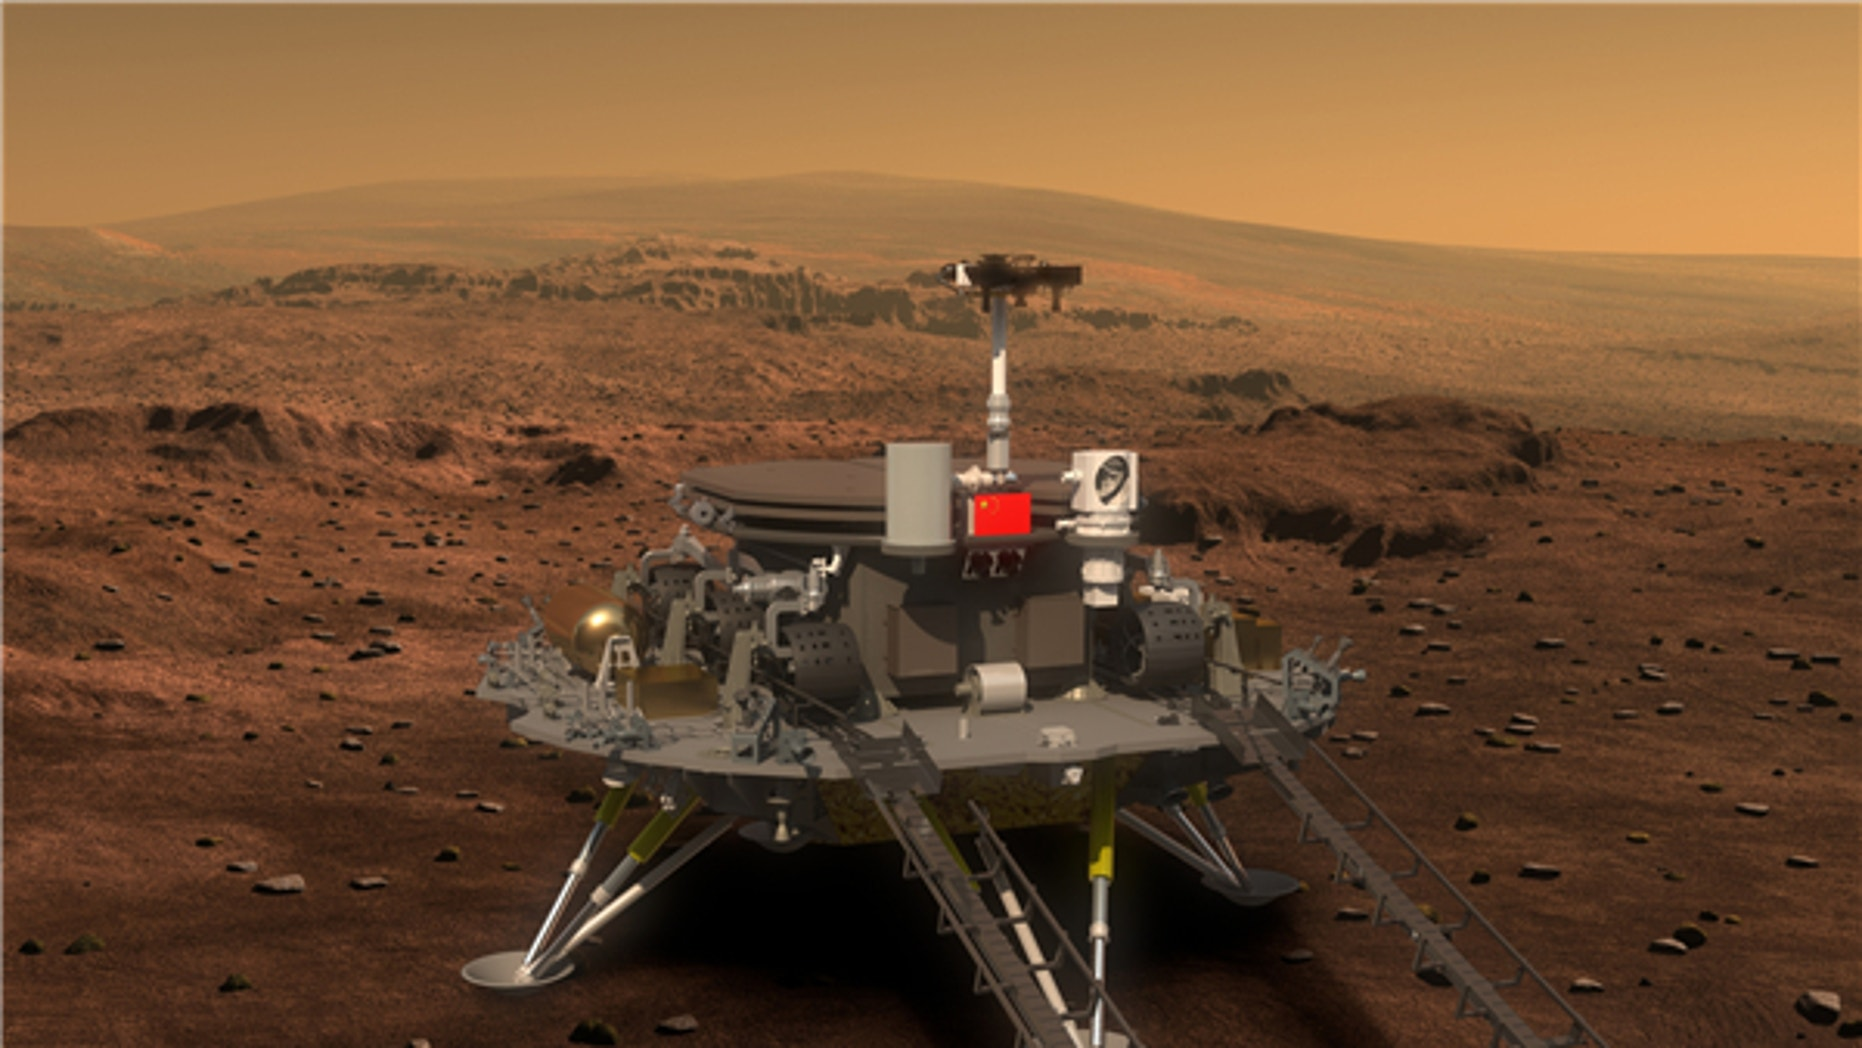 China's Mars lander and rover concept design (Xinhua).